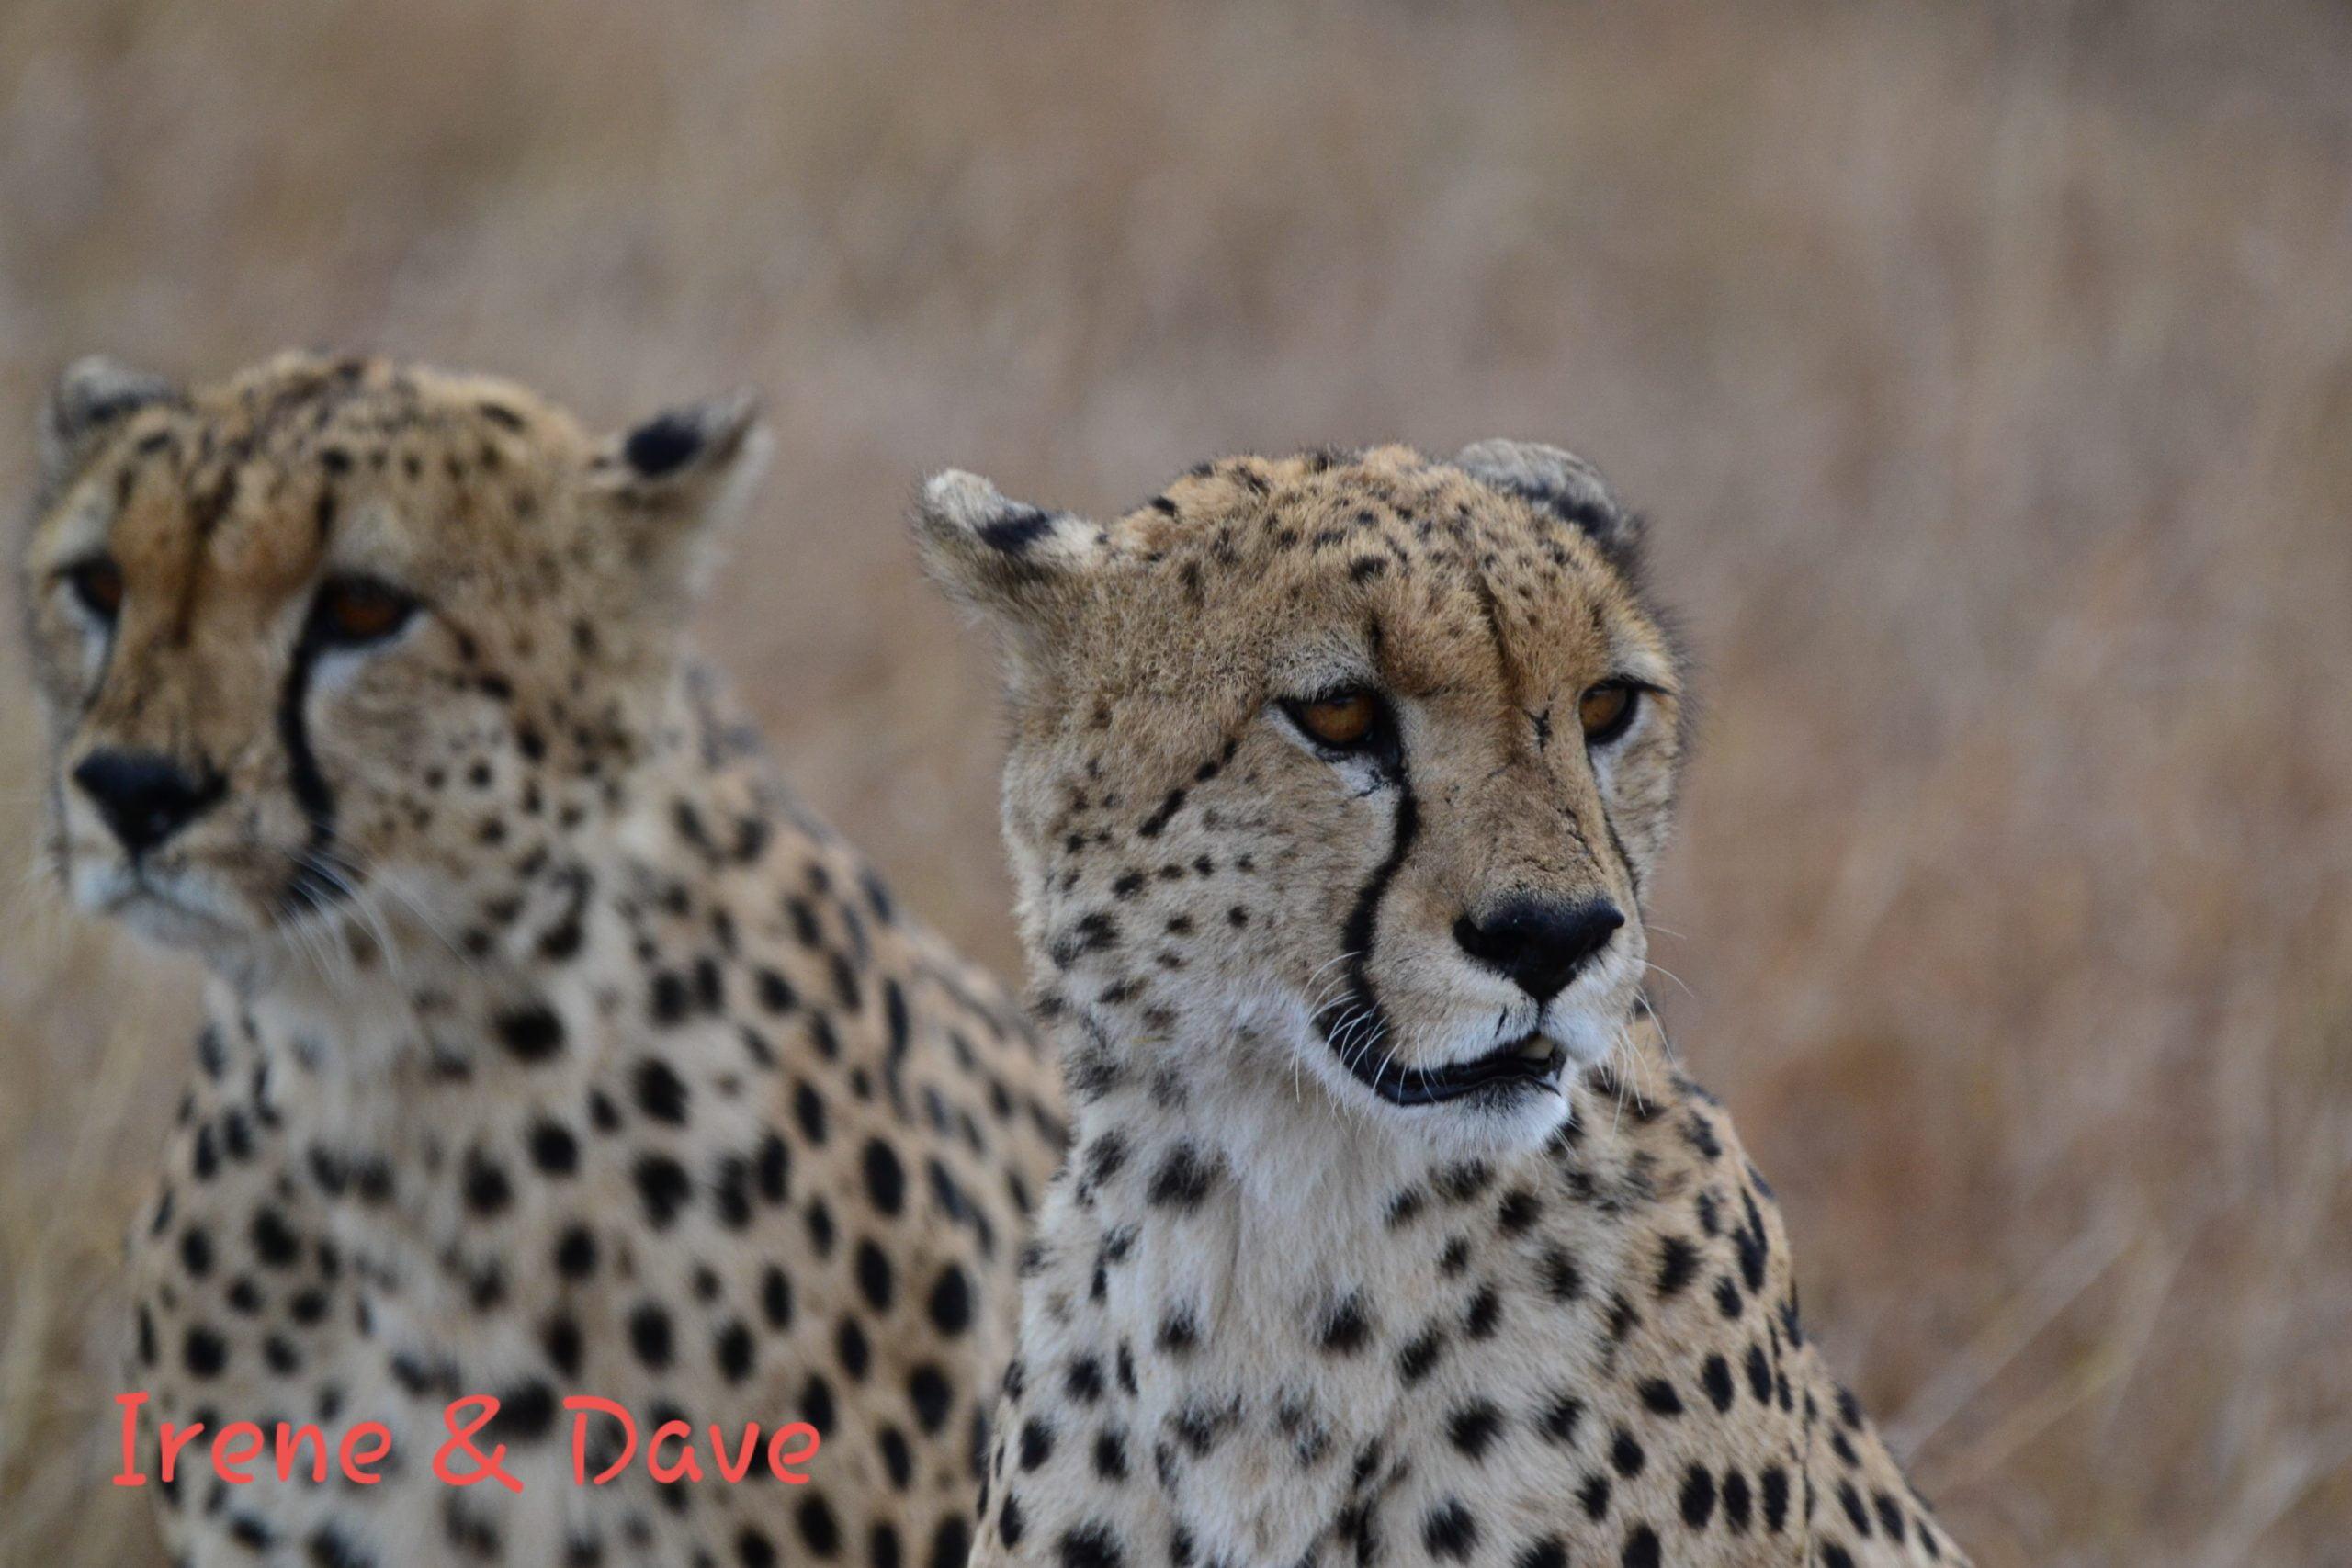 safar-in-kenia-klantreview-4.3